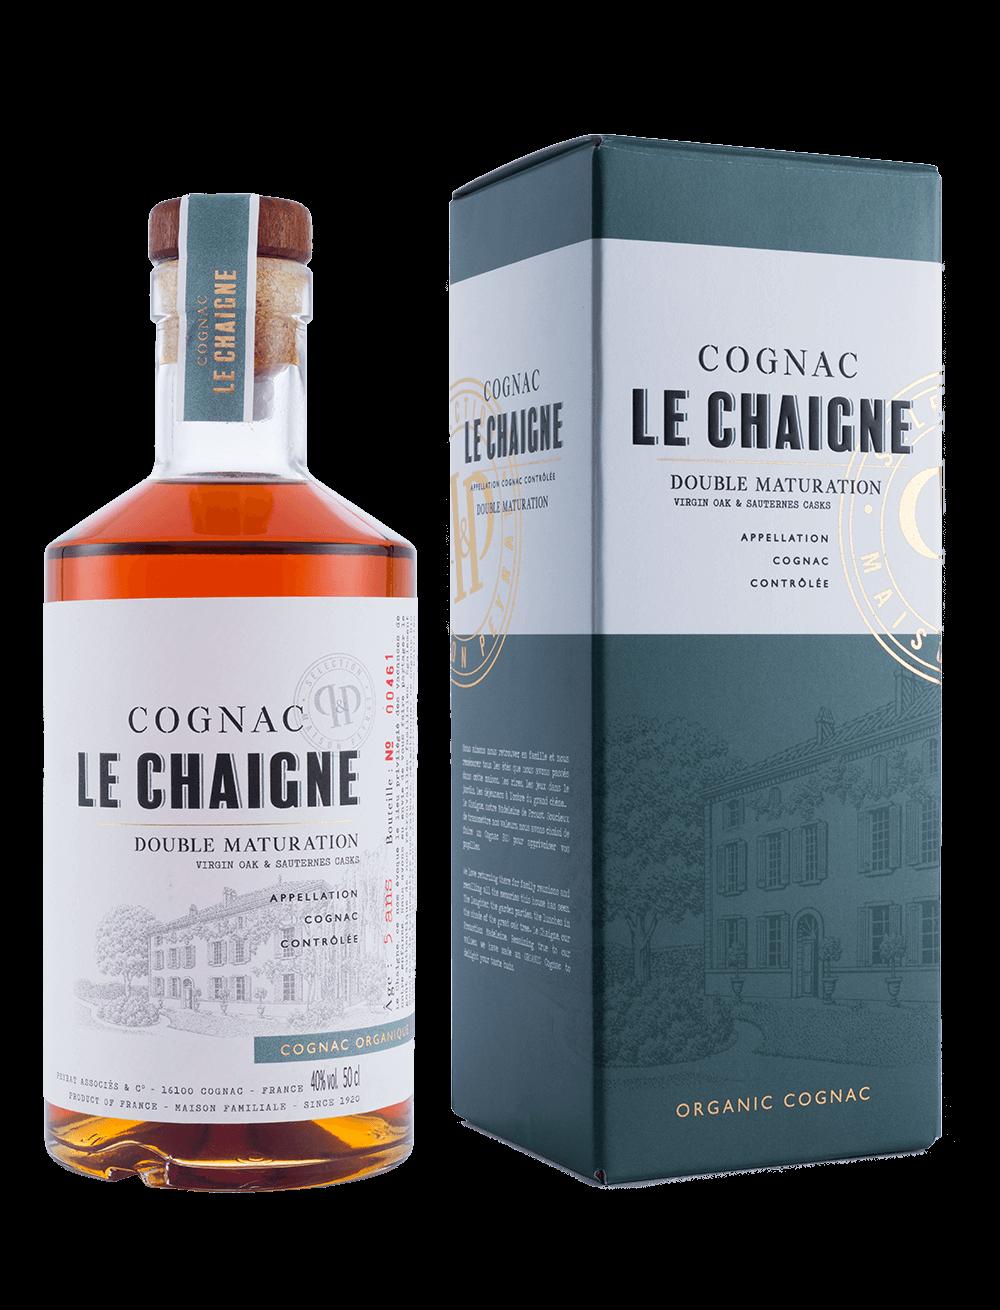 Cognac Le Chaigne Bio